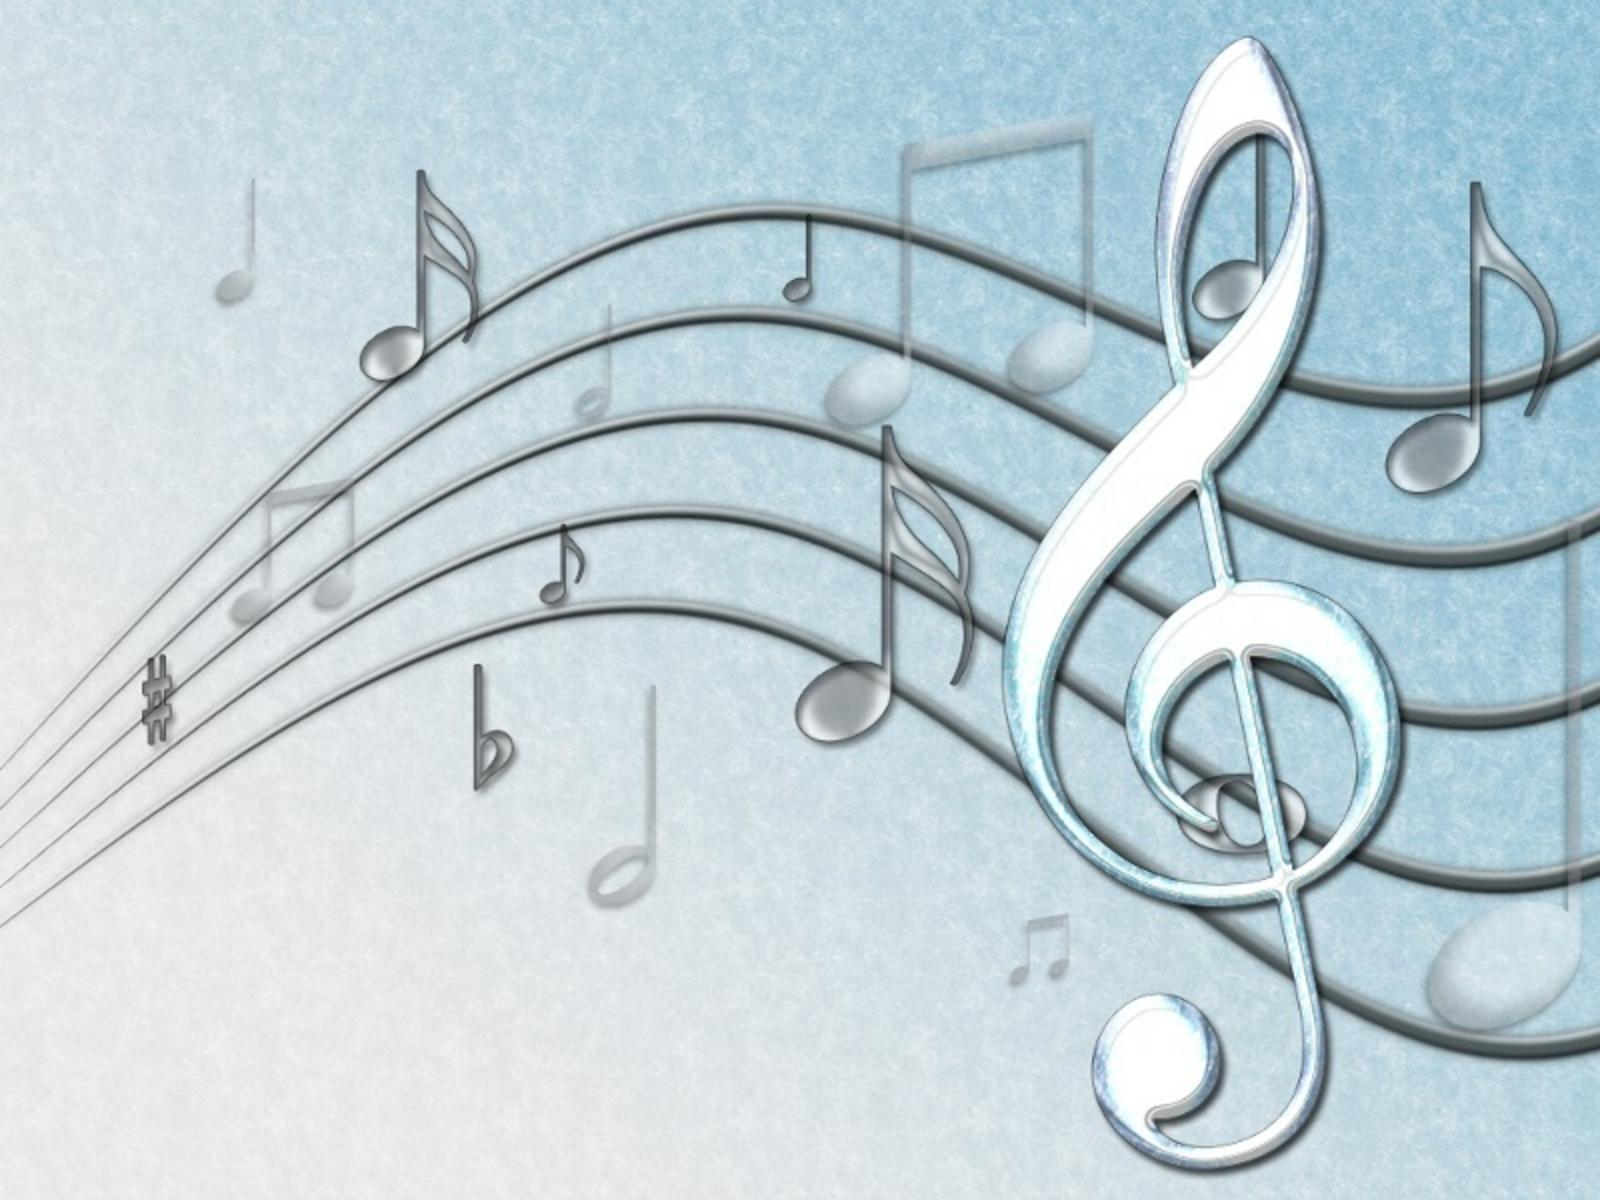 http://2.bp.blogspot.com/-5mwXRwzhz1I/Tl-ncRysEGI/AAAAAAAABPY/Uulf-wGM4sM/s1600/Music%252BWallpapers-1.jpg